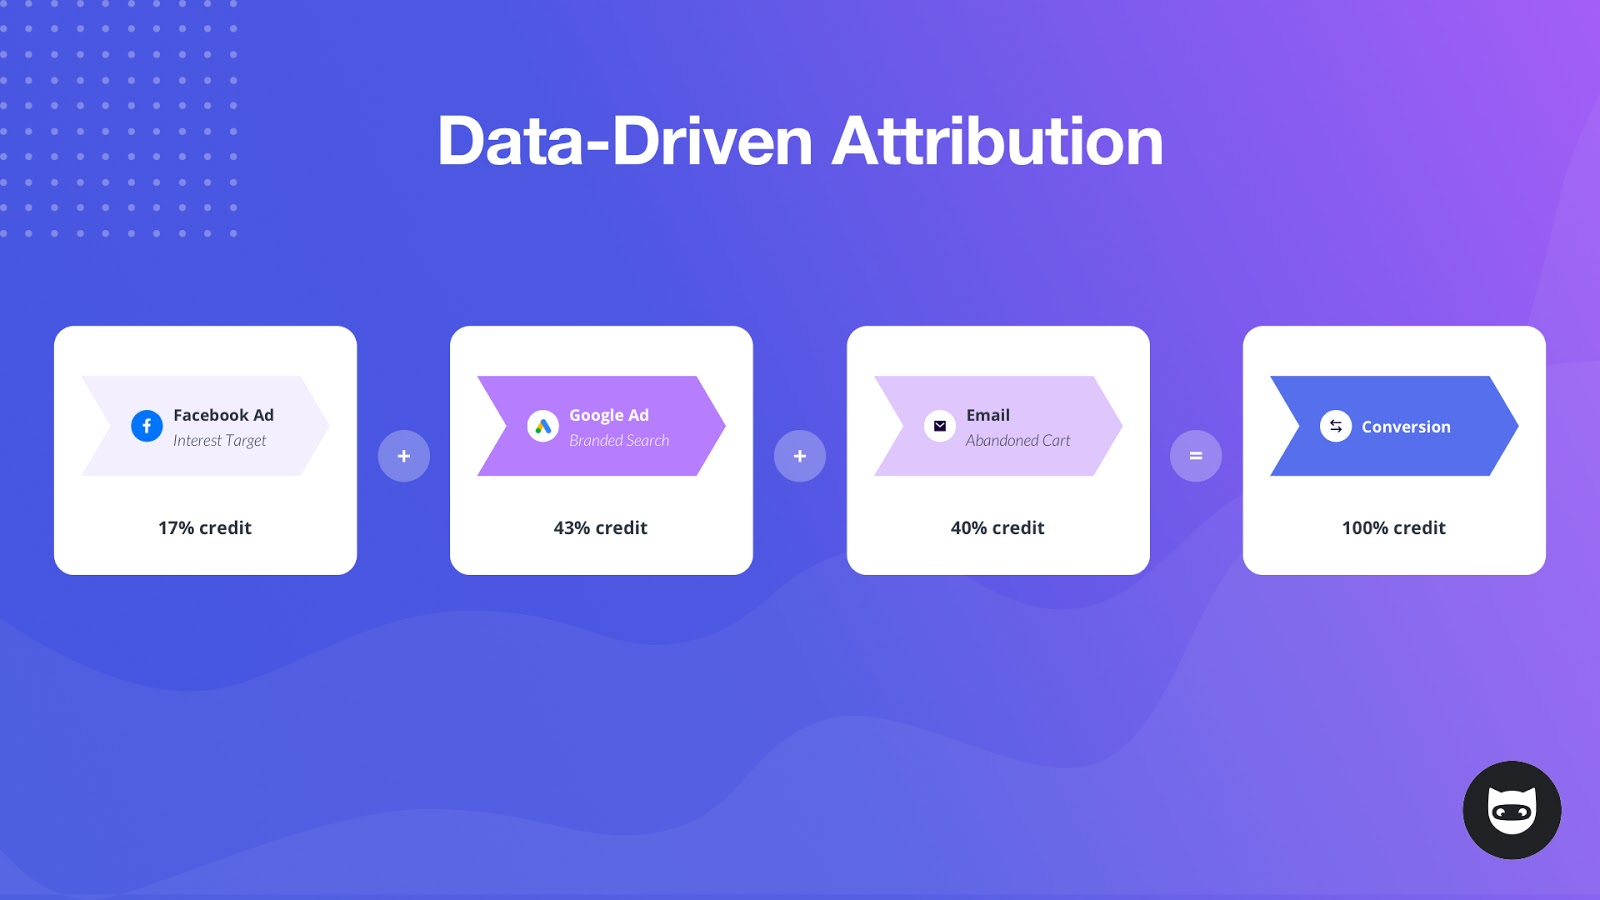 Data-Driven Attribution Model for Digital Marketing, NinjaCat